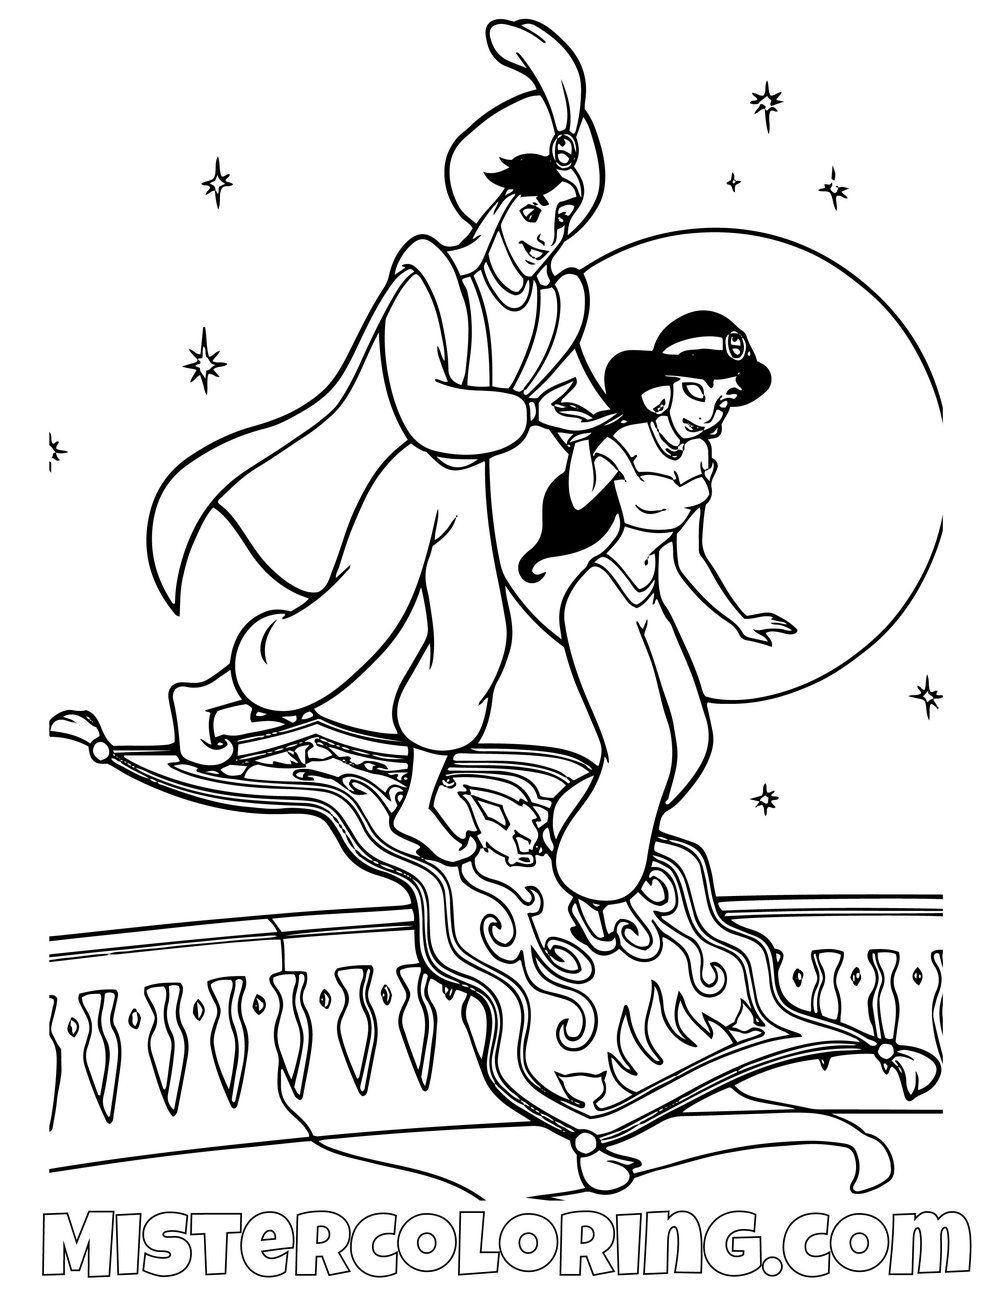 Aladdin Returning Princess Jasmine To Her Palace Aladdin Coloring